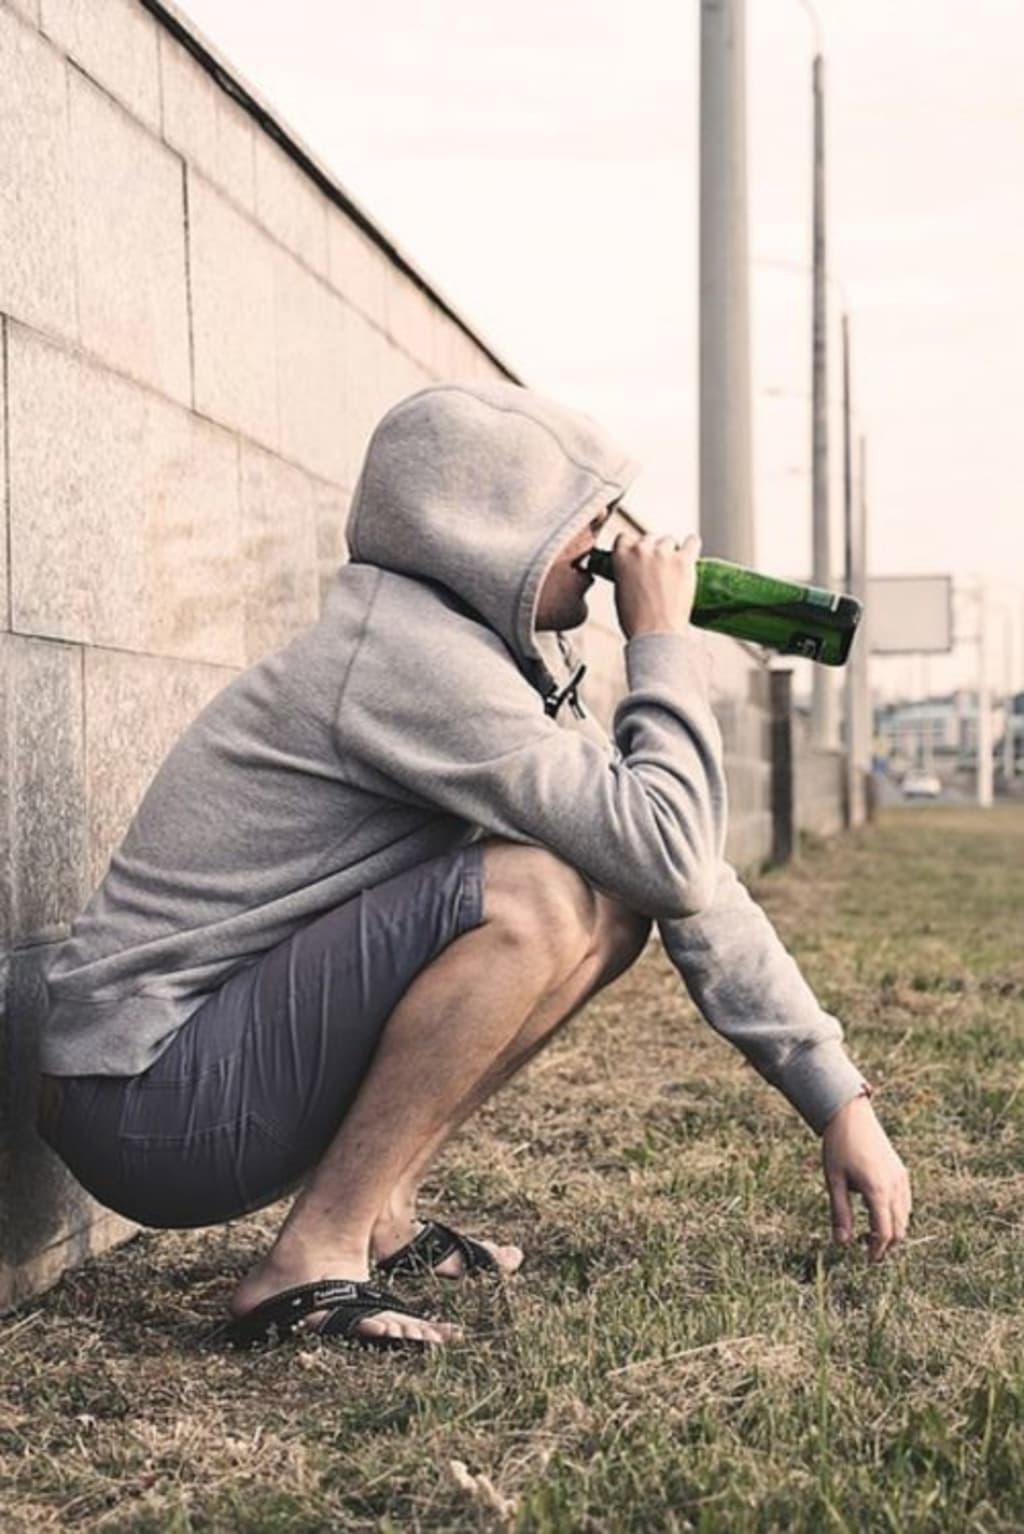 Adolescents and Addiction